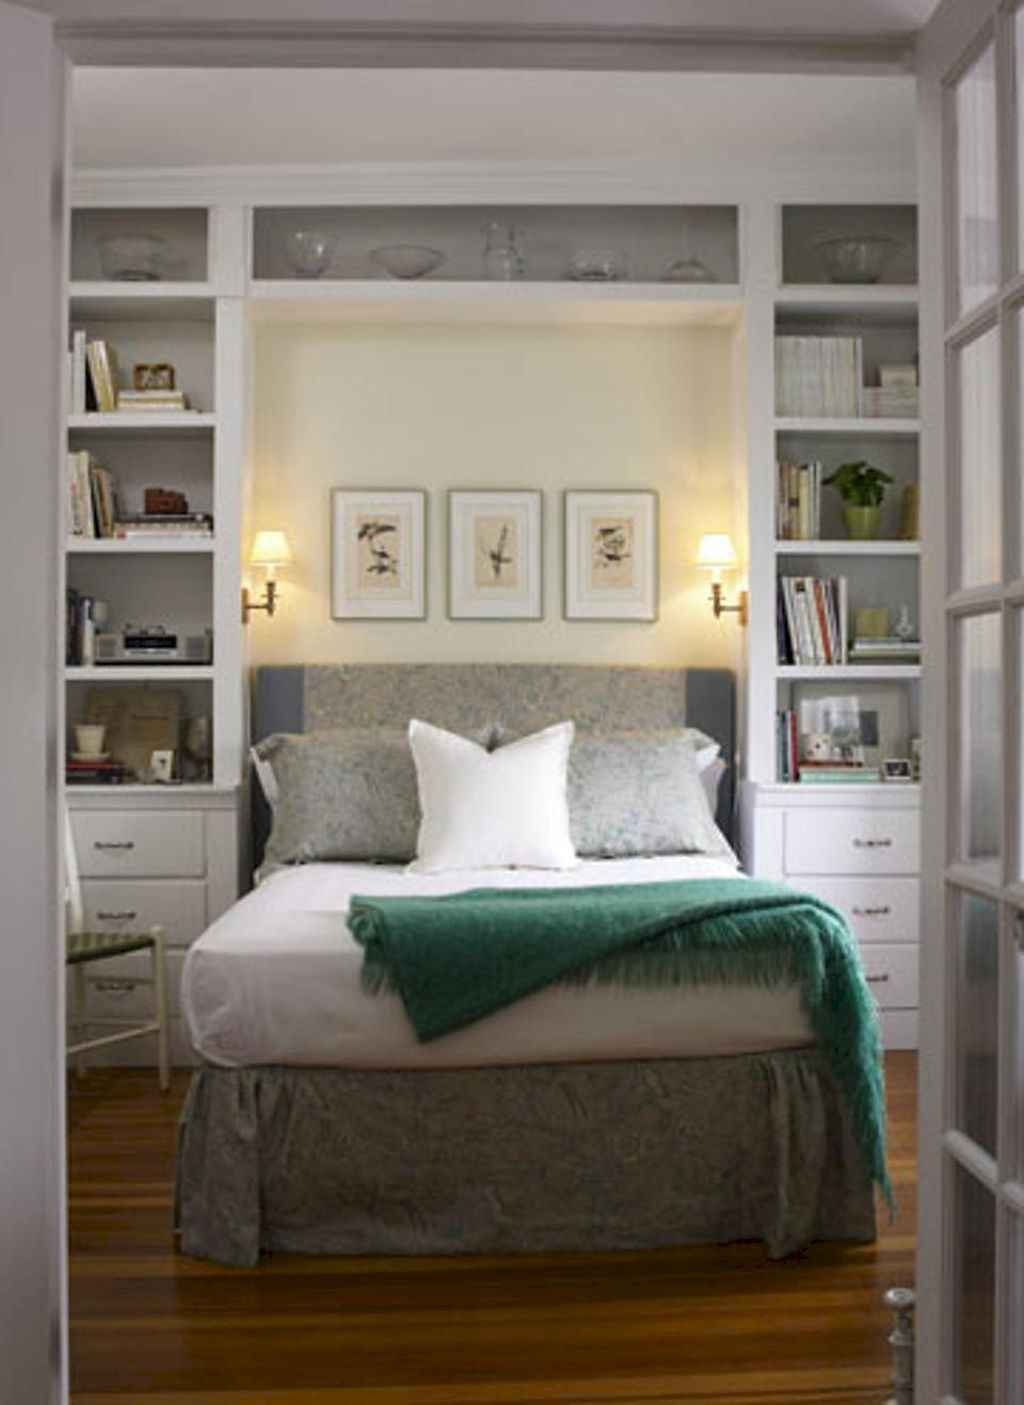 Incredible master bedroom ideas (8)